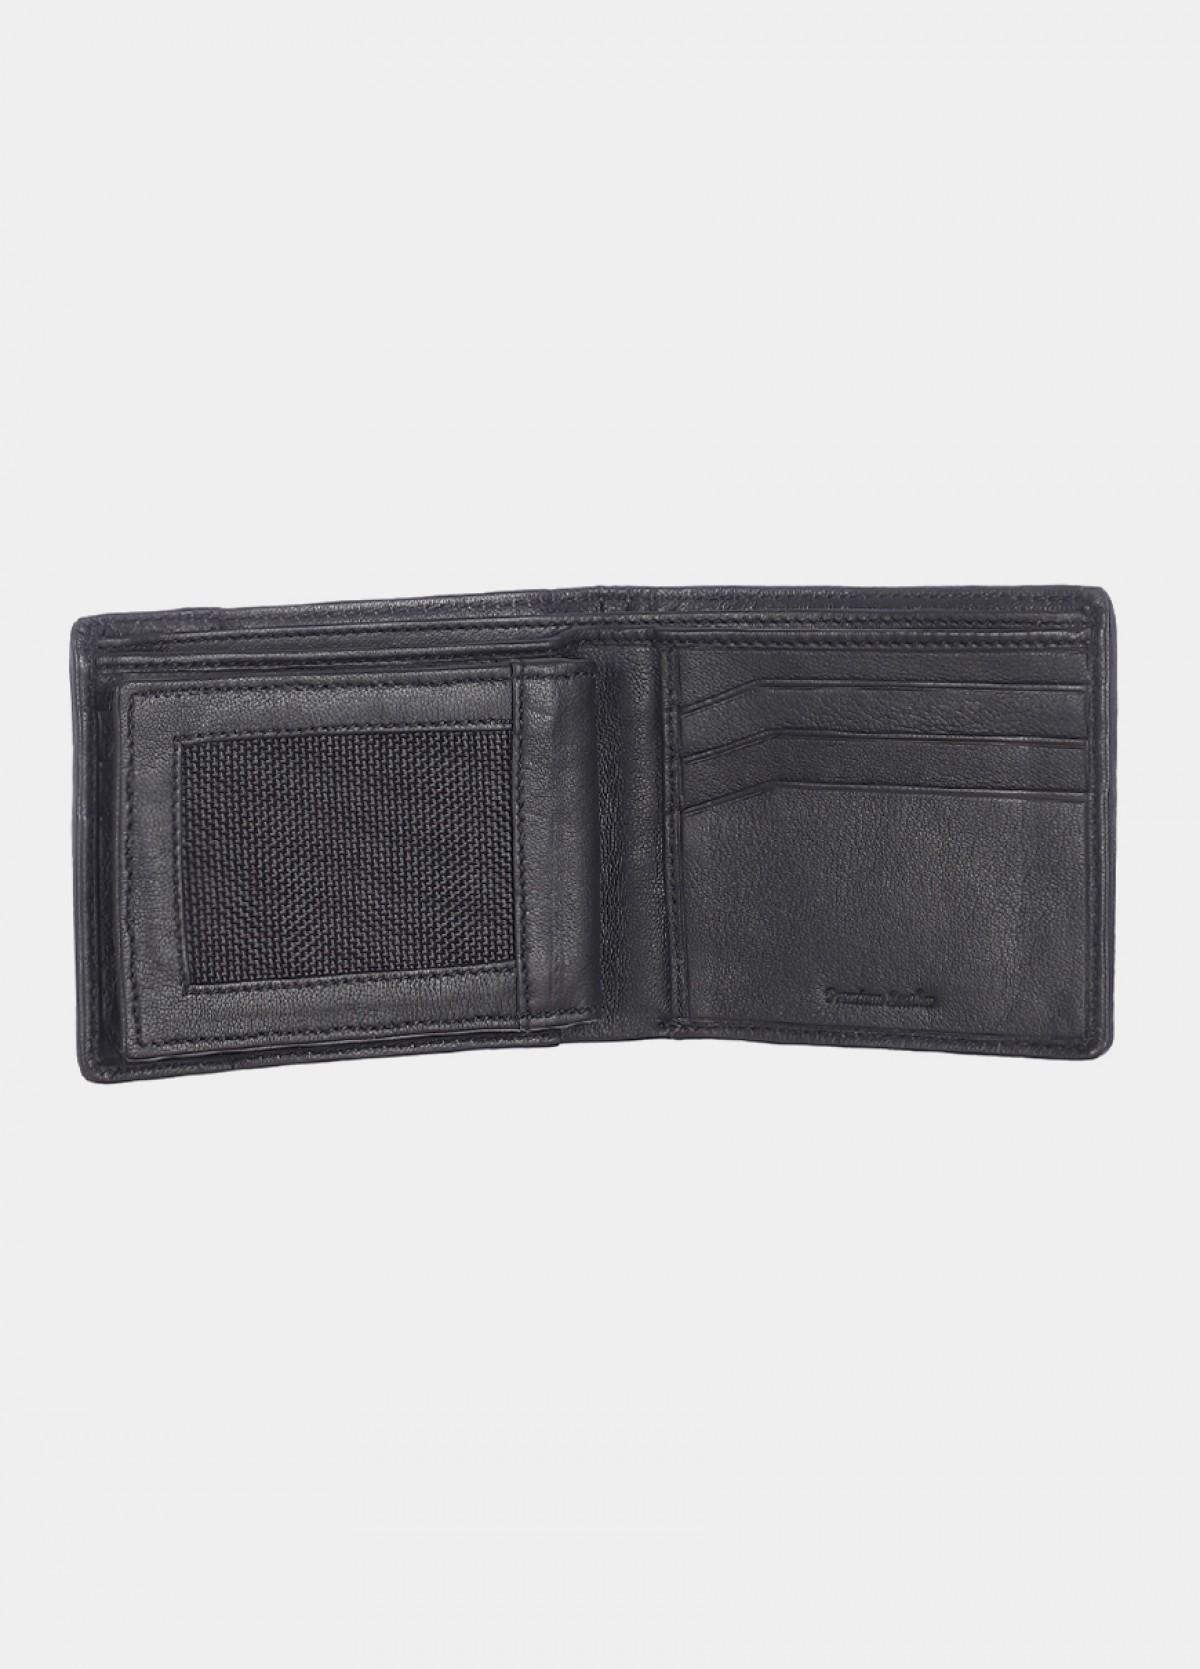 Him & The City Men'S Black Bi-Fold Wallet With Cc Insert